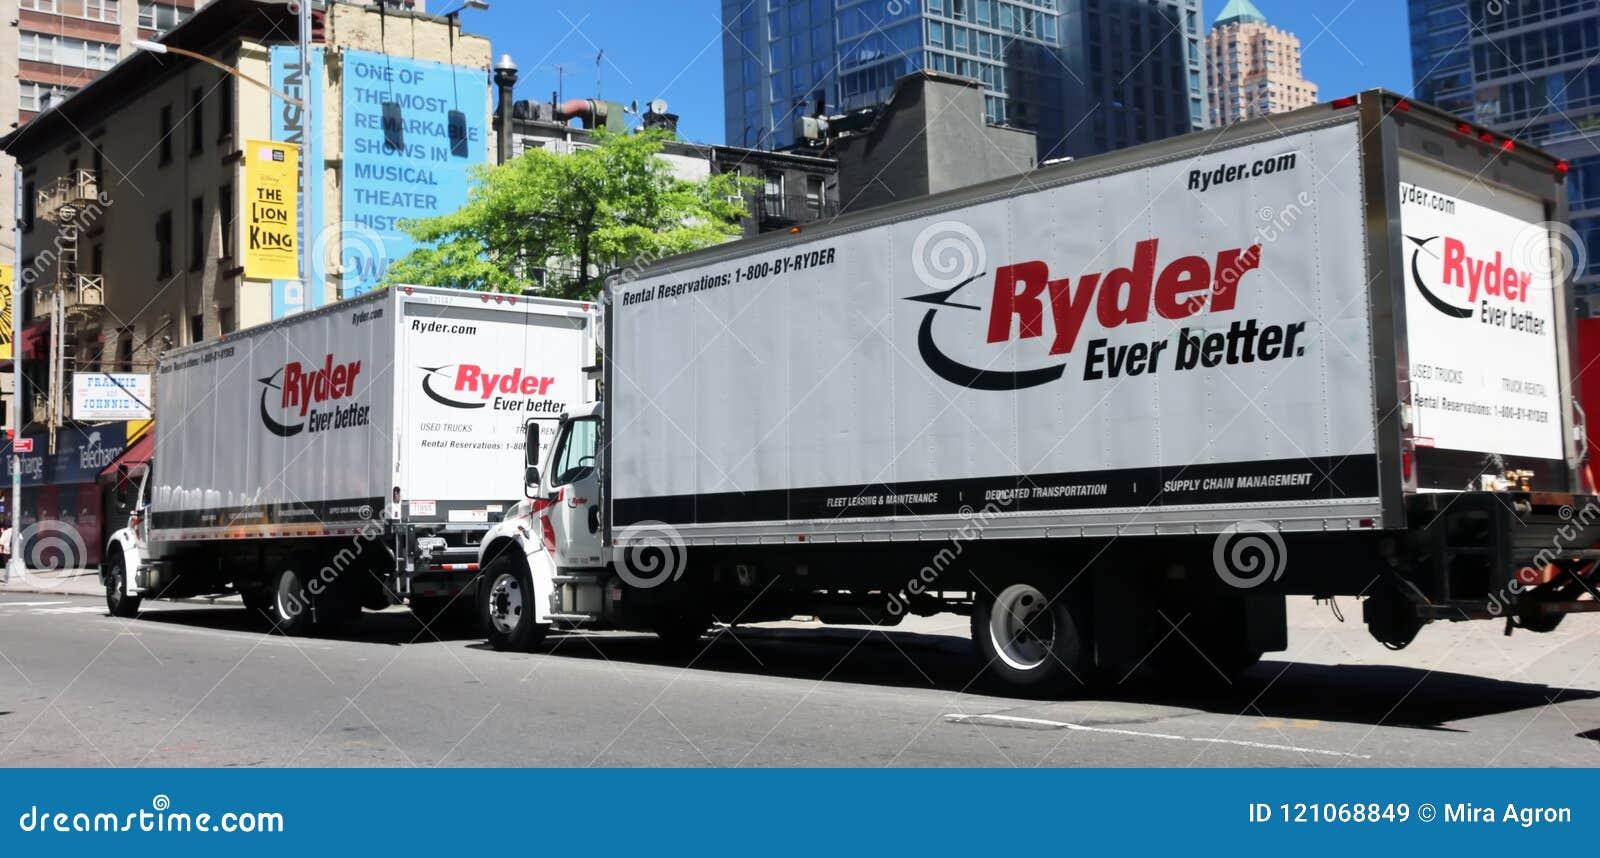 Trucks For Rent >> Ryder Trucks For Rent Editorial Stock Image Image Of Manhattan